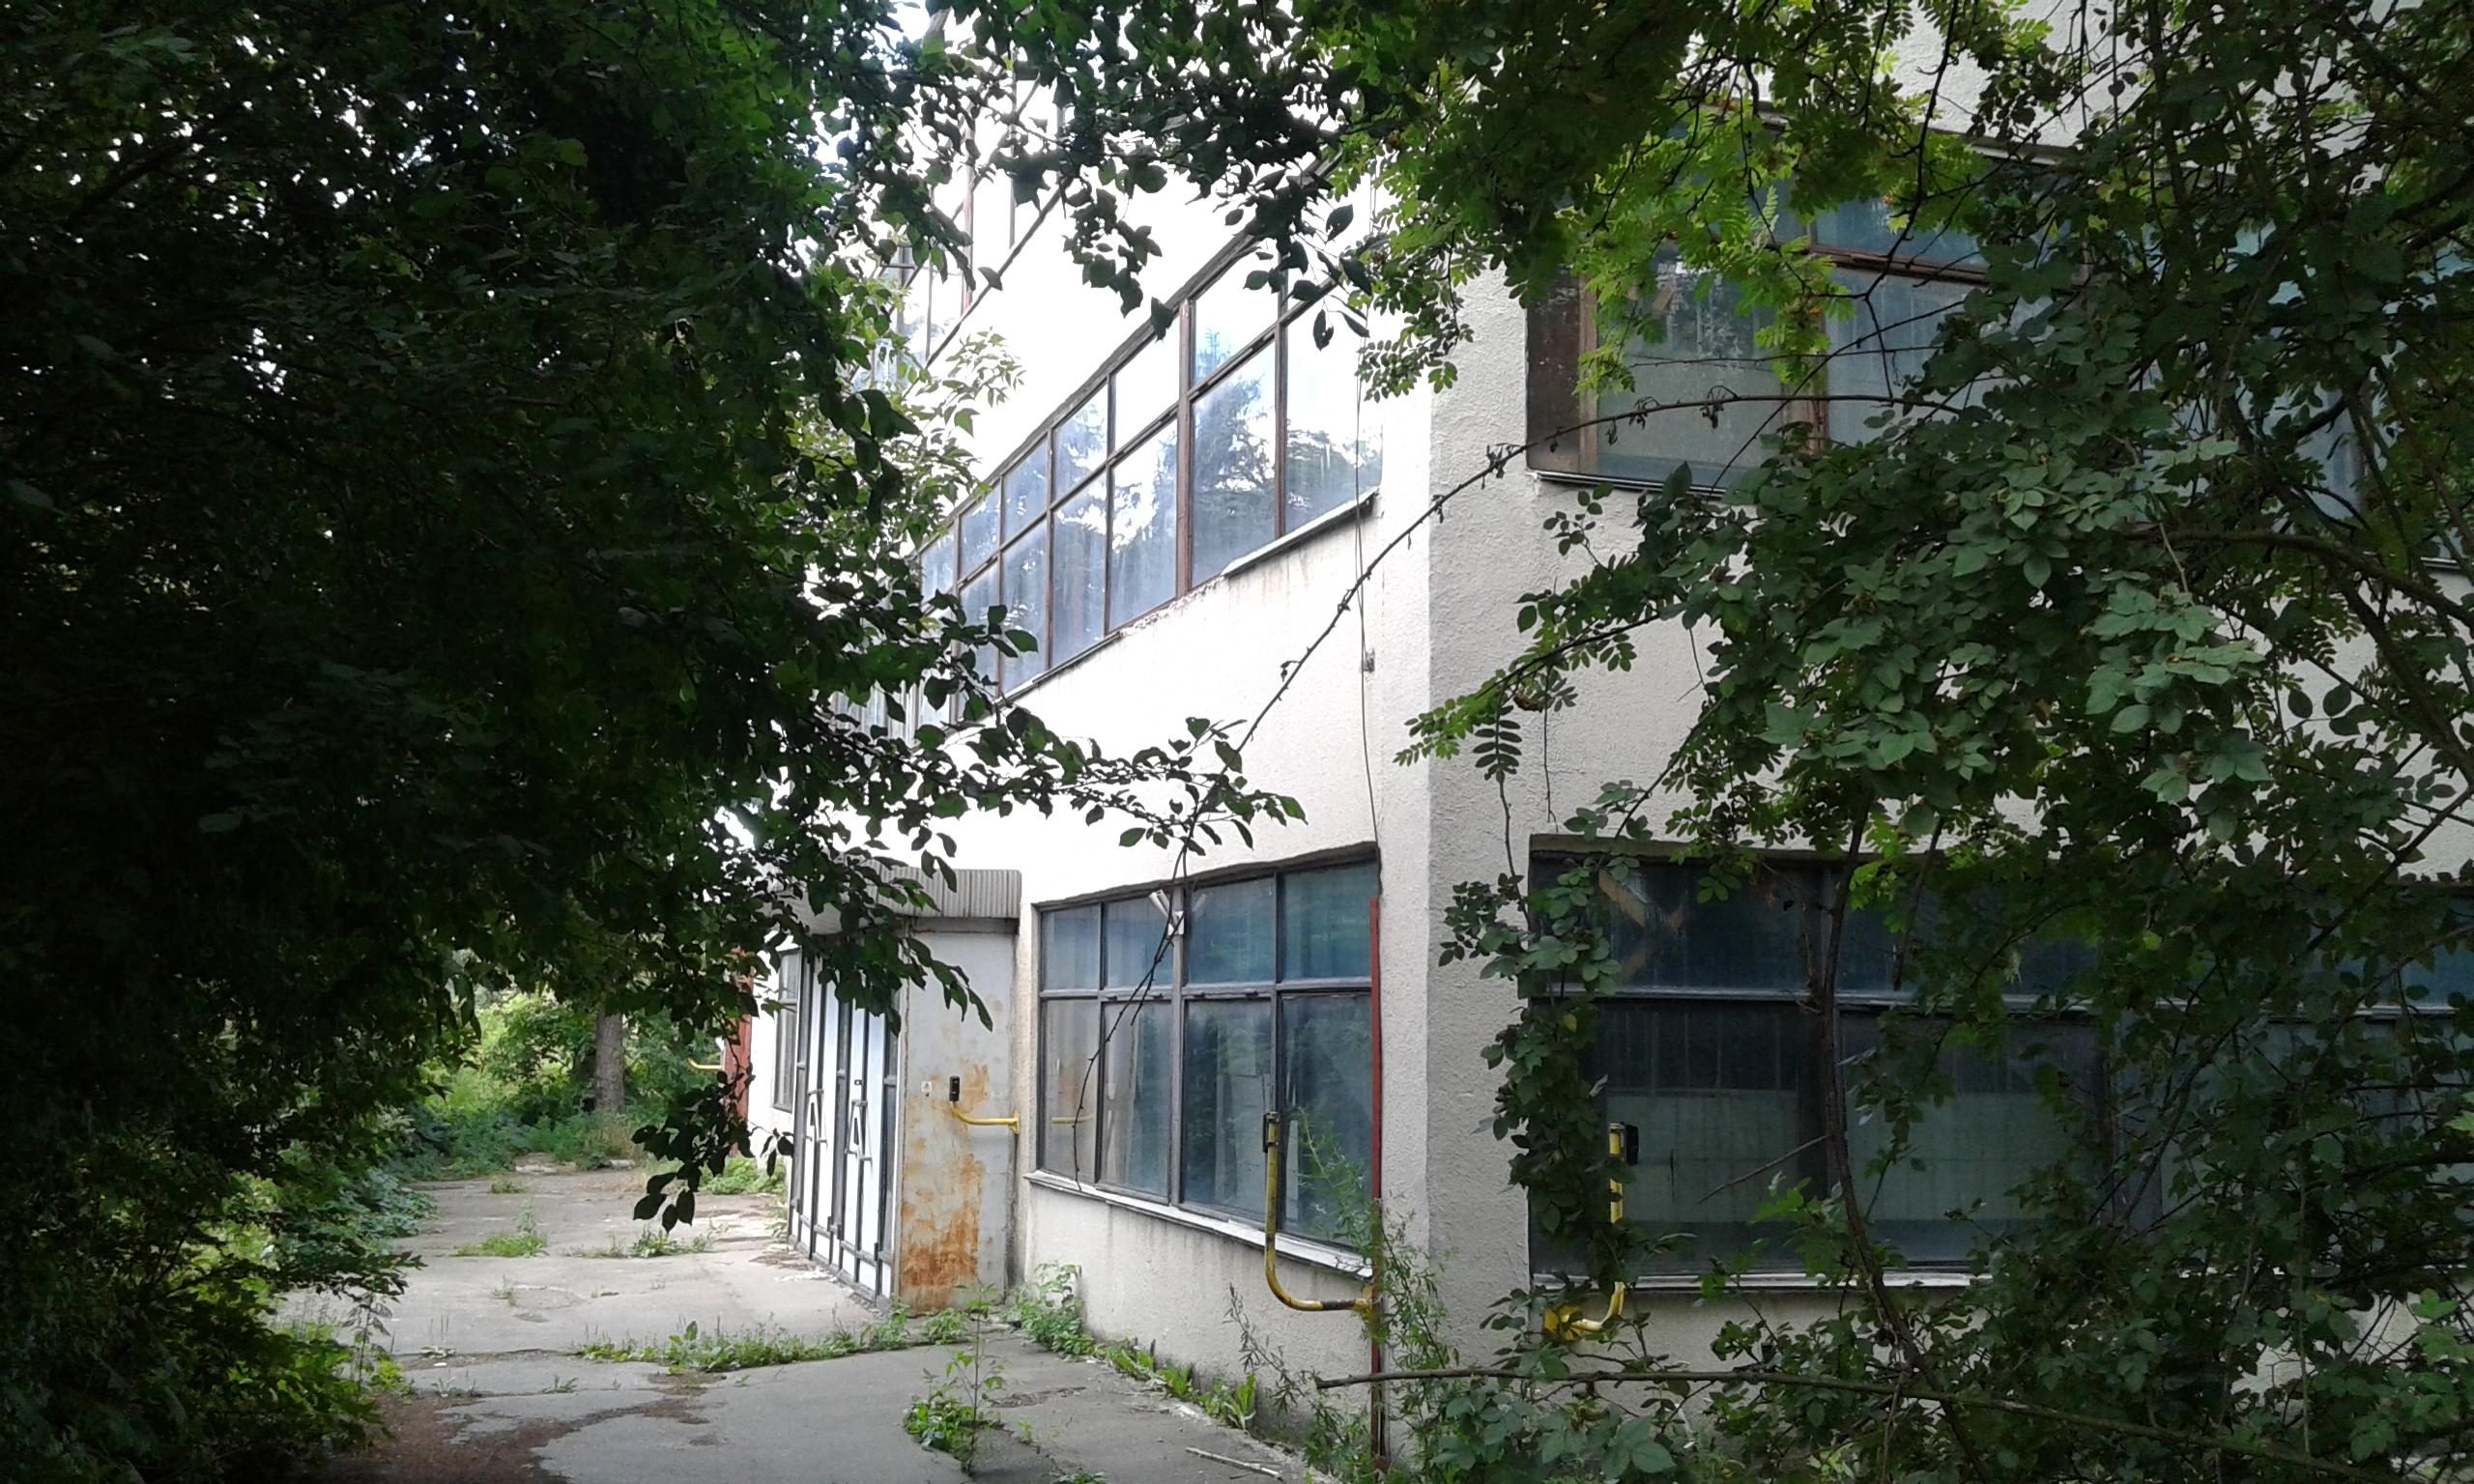 Нежитлове приміщення в м. Рівне, загальною площею 227,1 кв. м